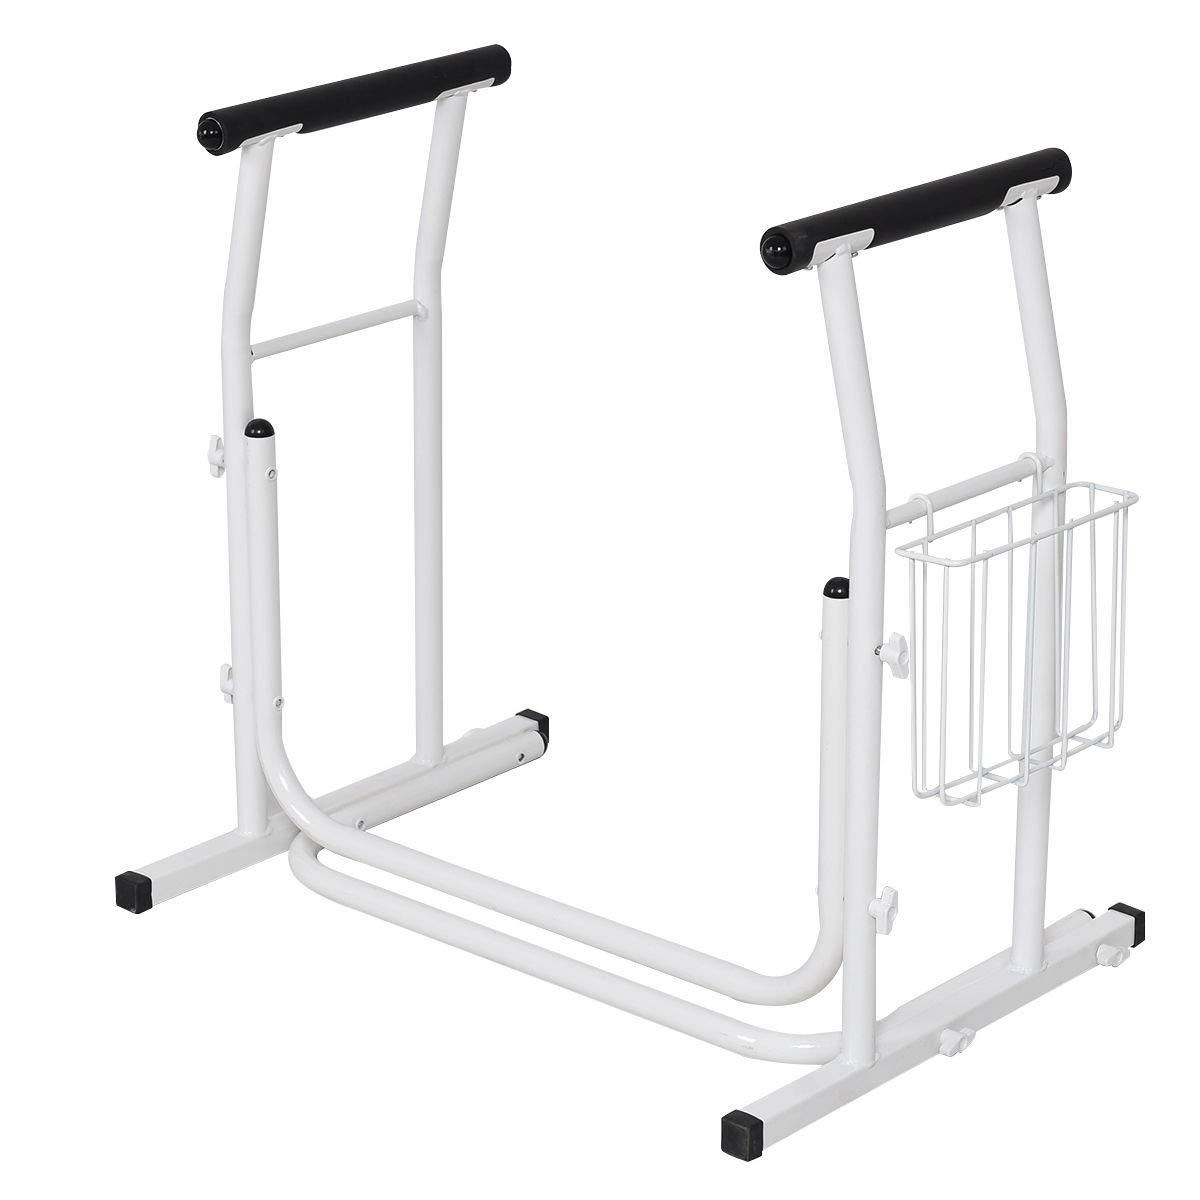 USA_Best_Seller White Medical Free Standing Toilet Safety Padded Armrest Freestanding Baby Handicap Elderly Trainer Comfortable New Durable